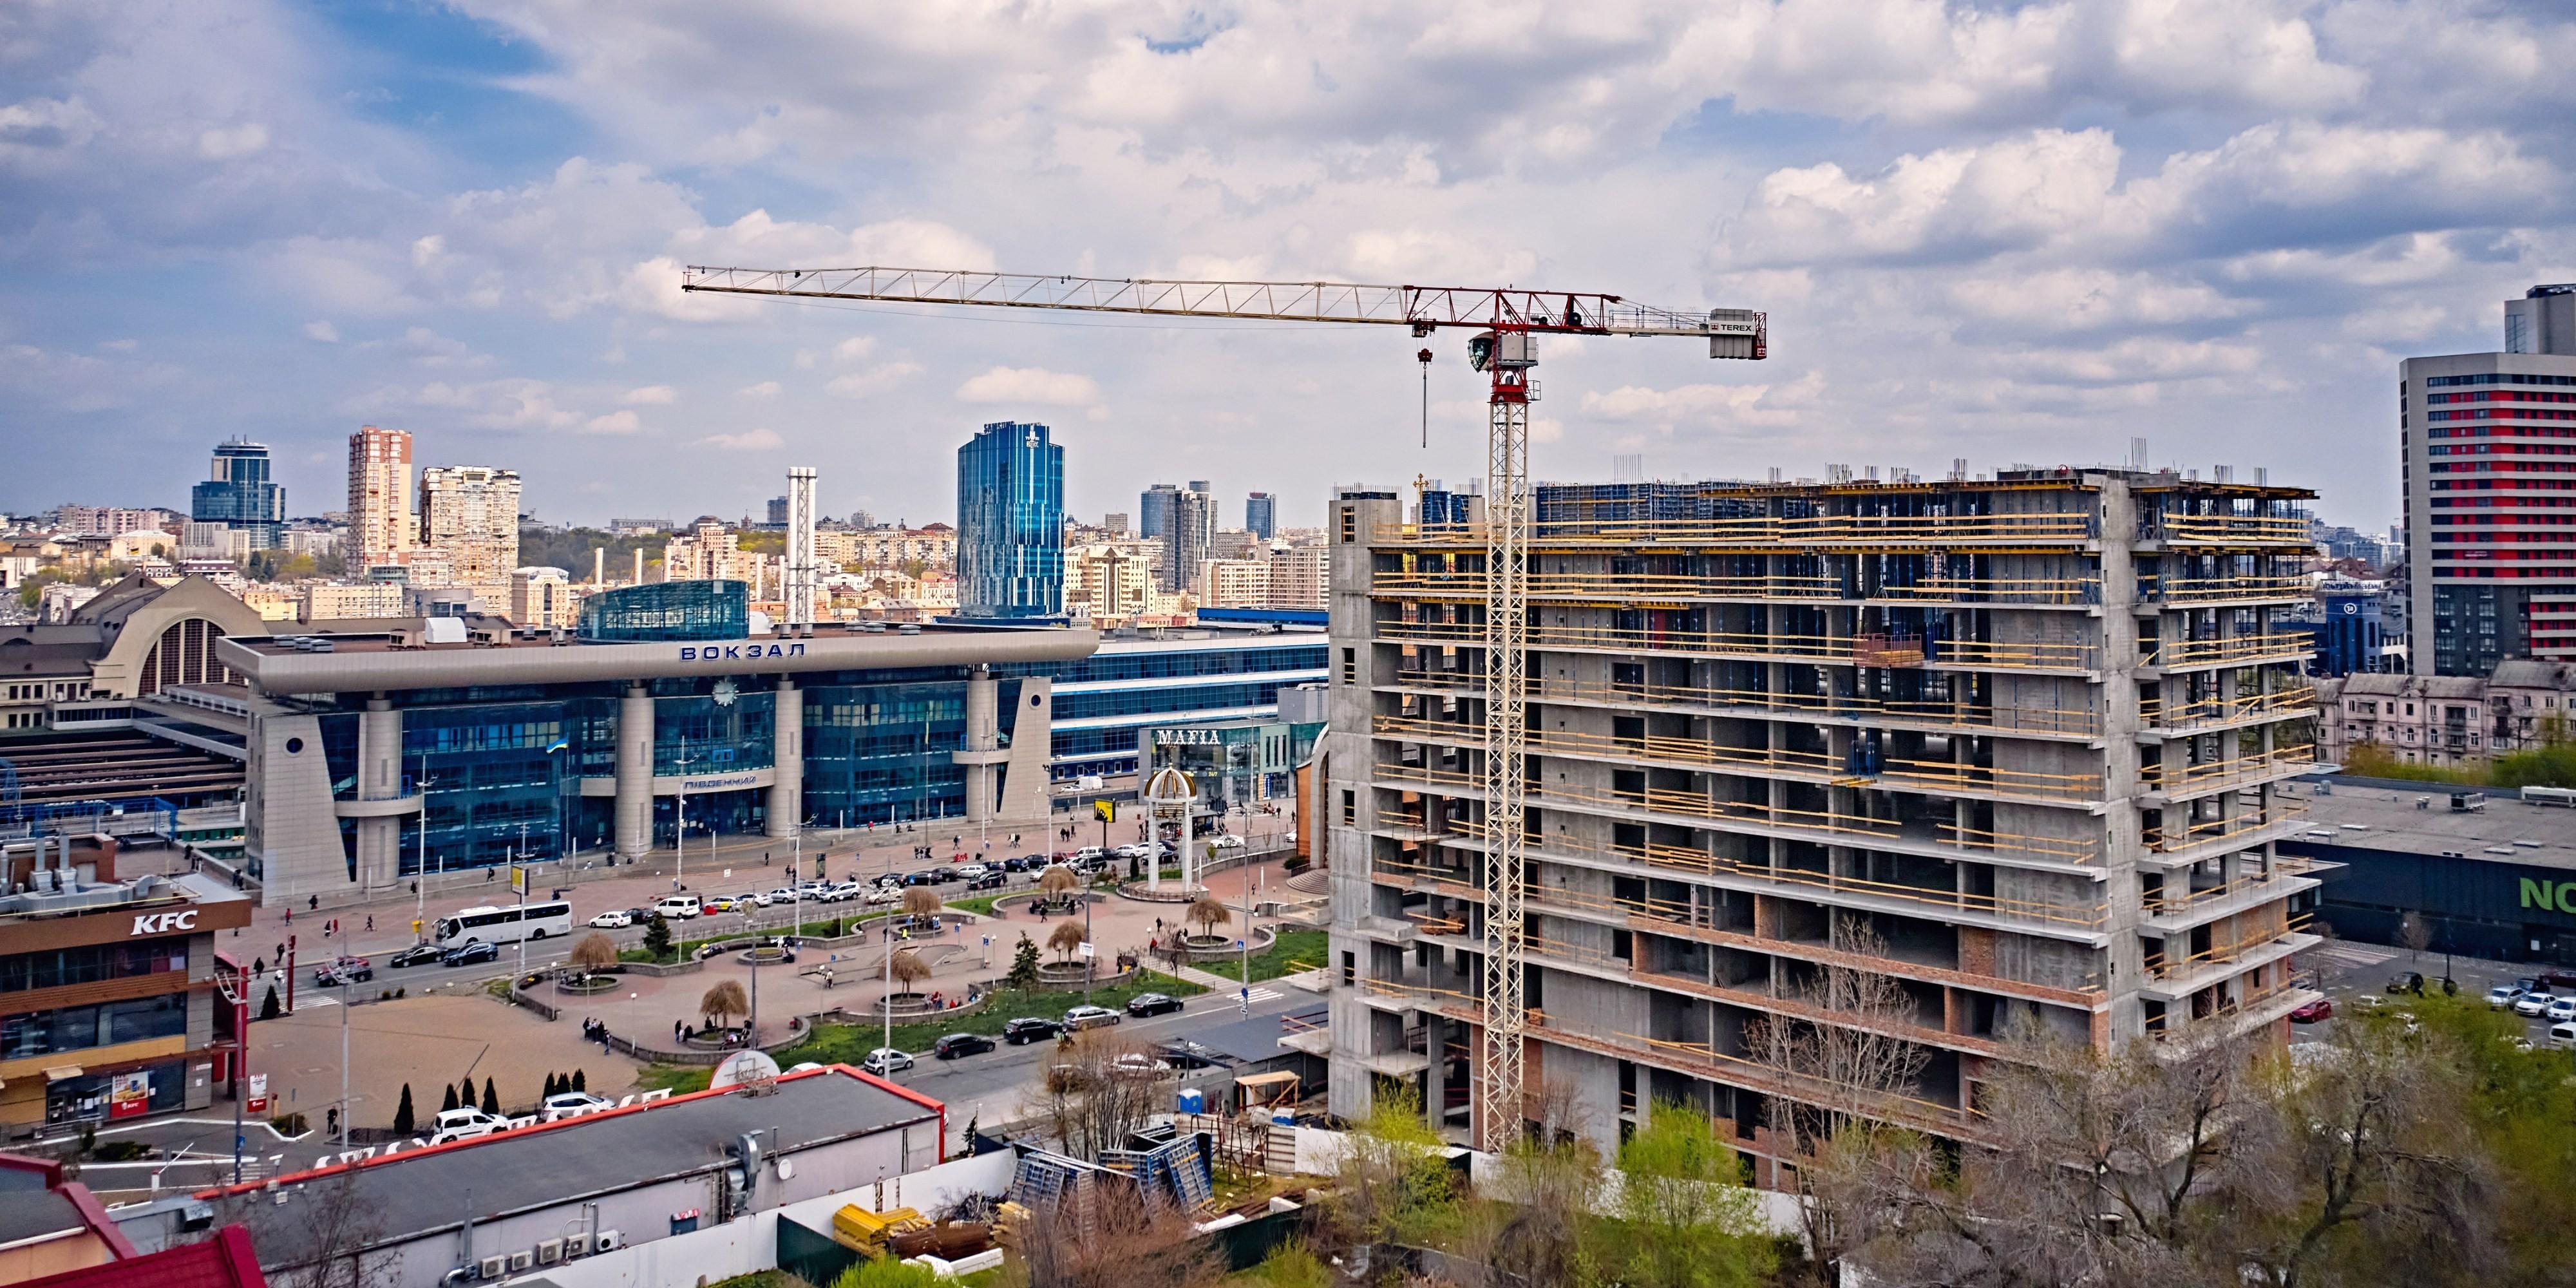 Construction progress of S1 TERMINAL. APRIL 2021